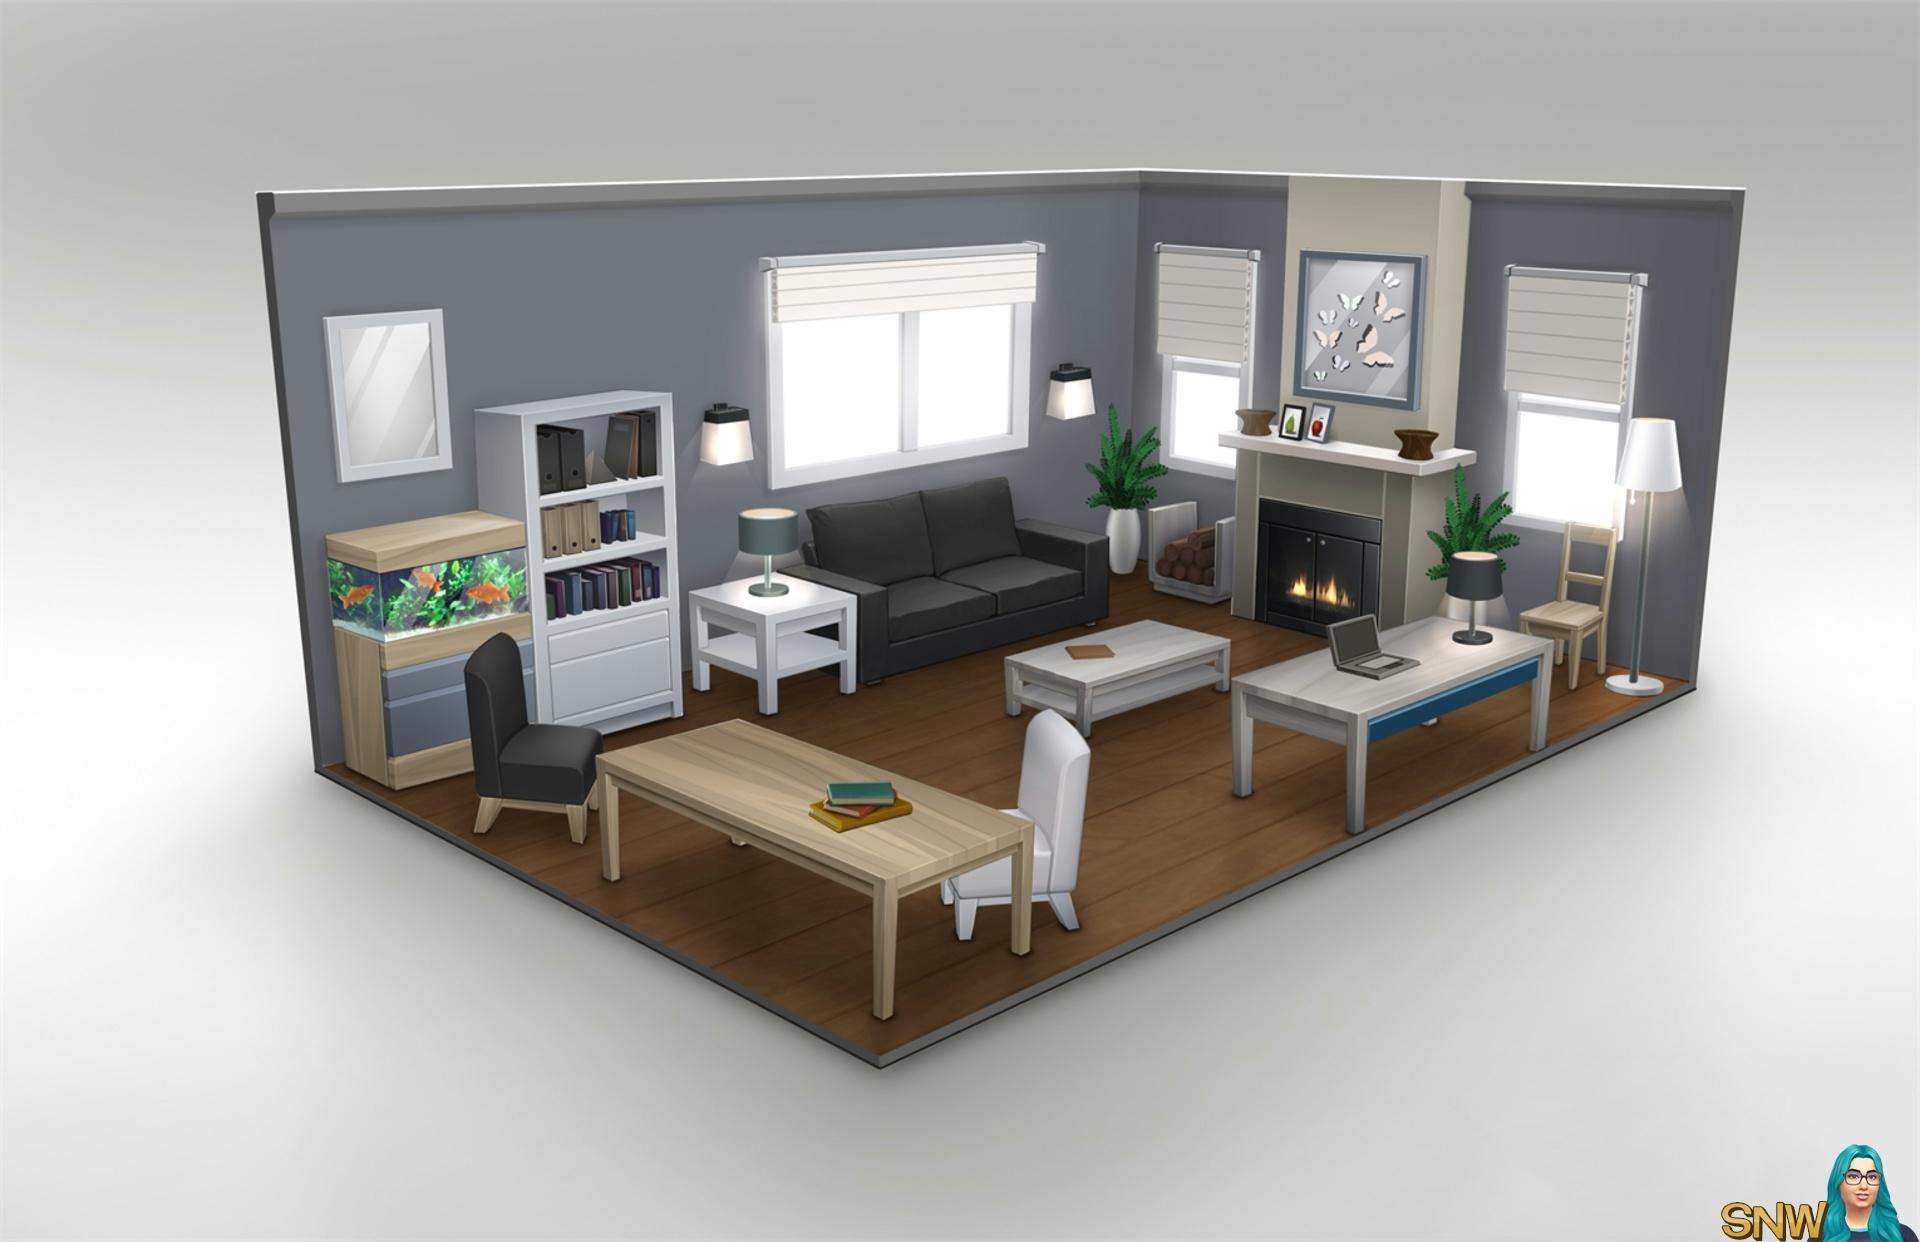 SuburbanContempo_Interior_LivingRoom.jpg?itok=4yTDLG7M